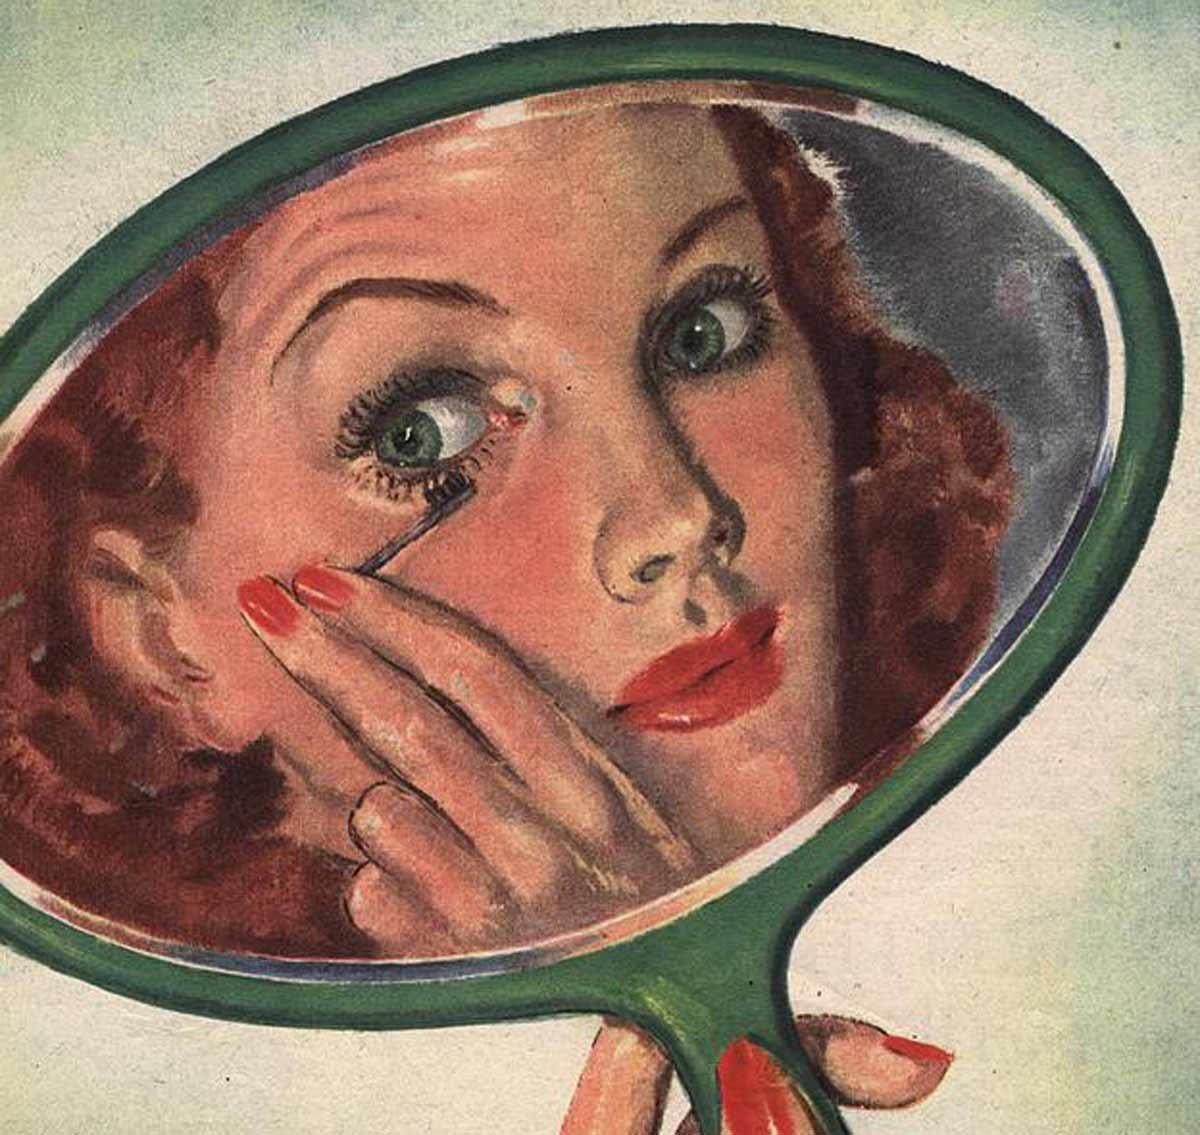 1940s Beauty – Eye Make-up Lesson 1941 | Glamourdaze